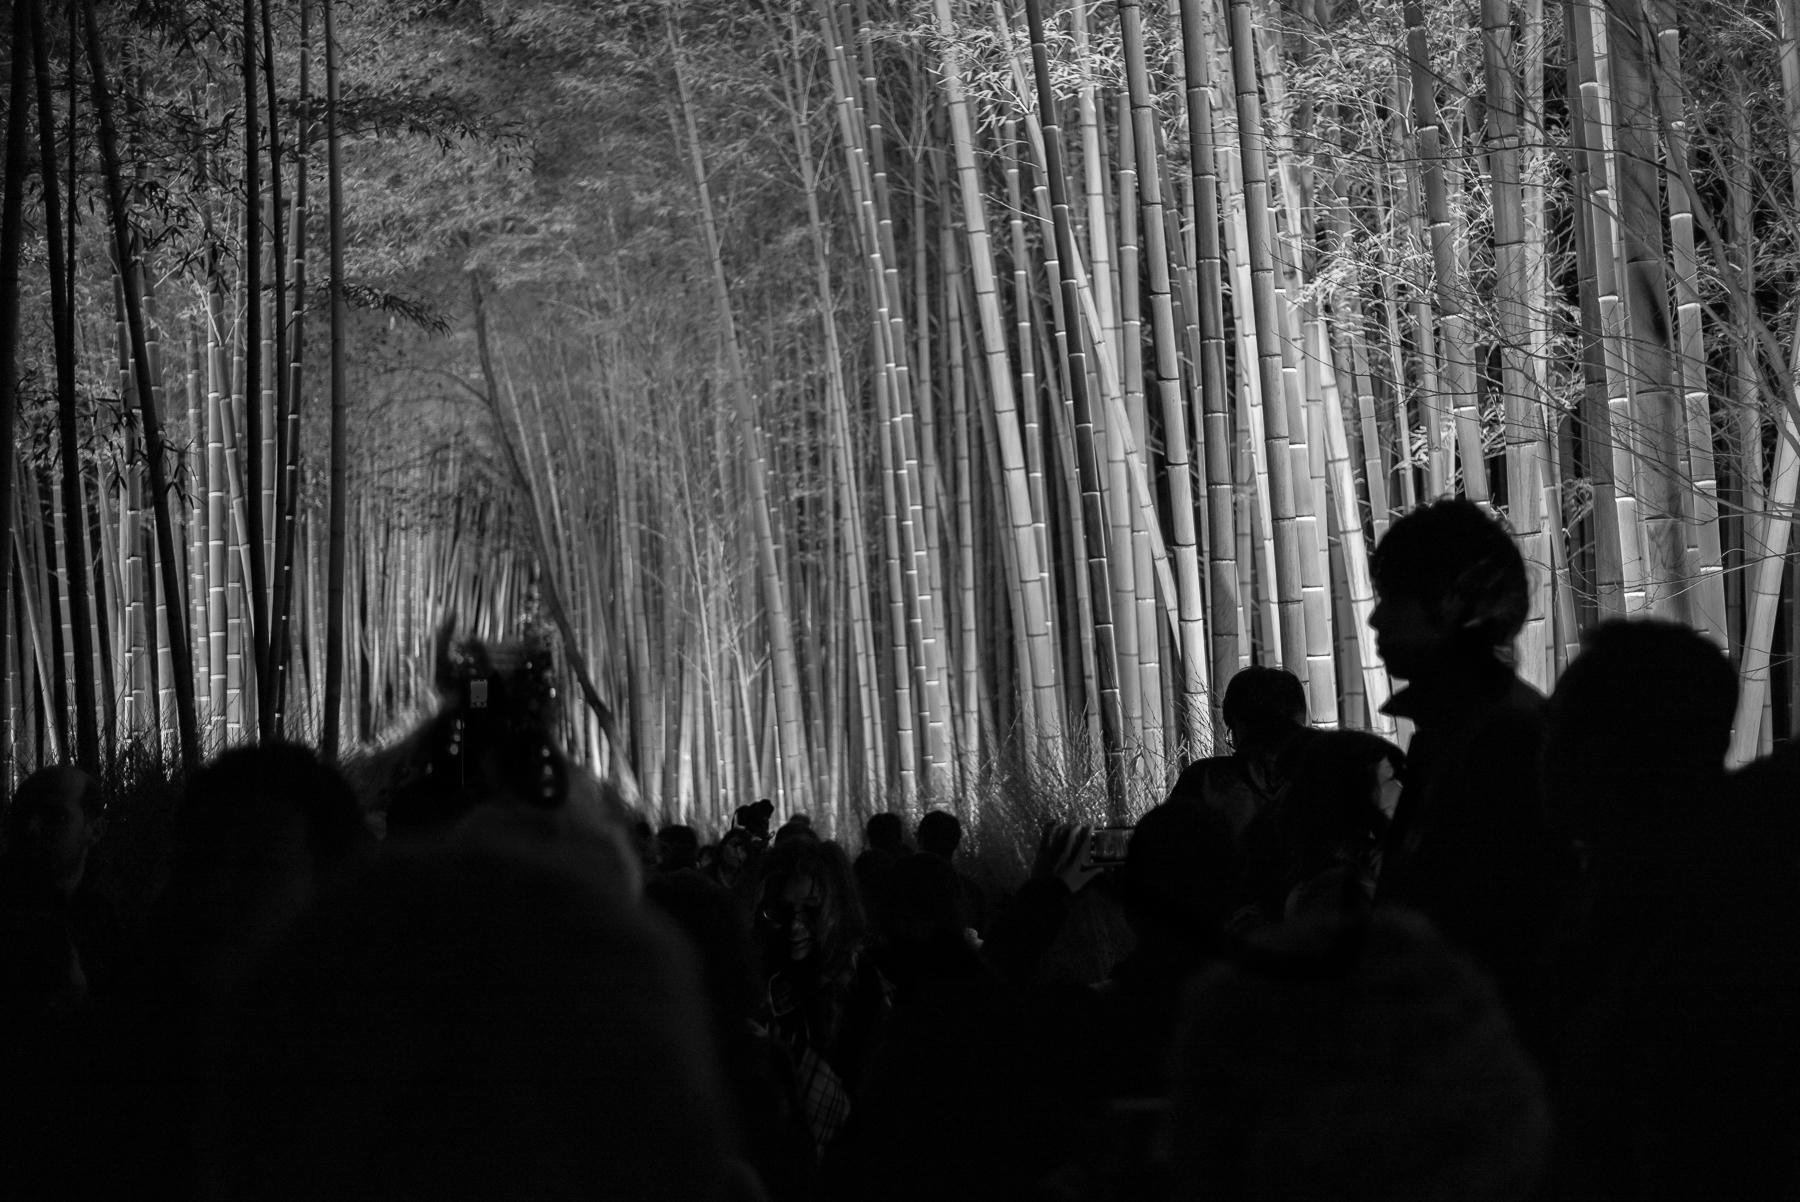 Bamboo Nights